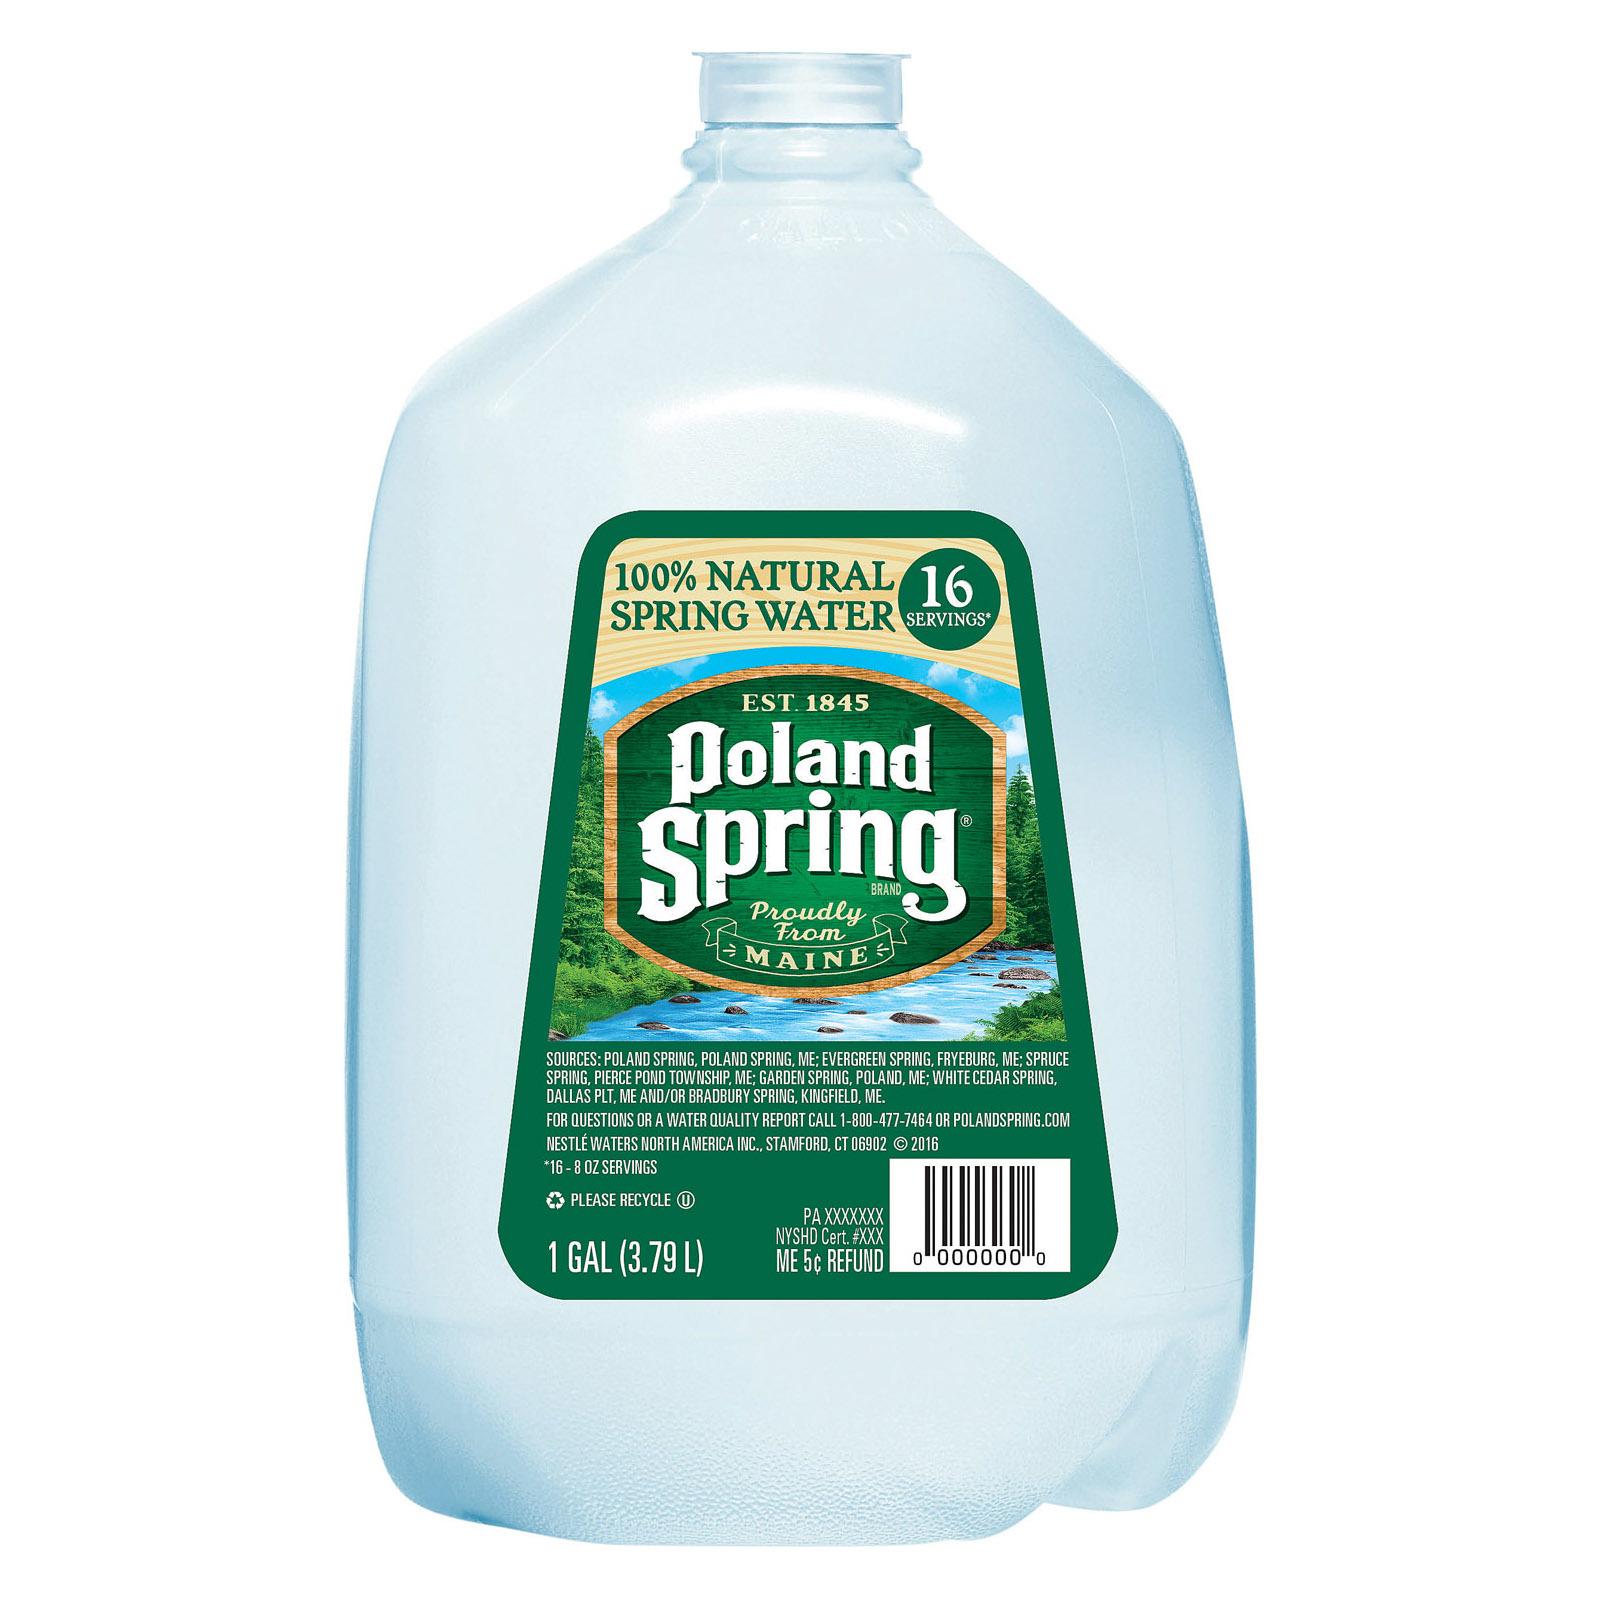 Poland Spring Sparkling Water - Original - Case of 6 - 1 Gal